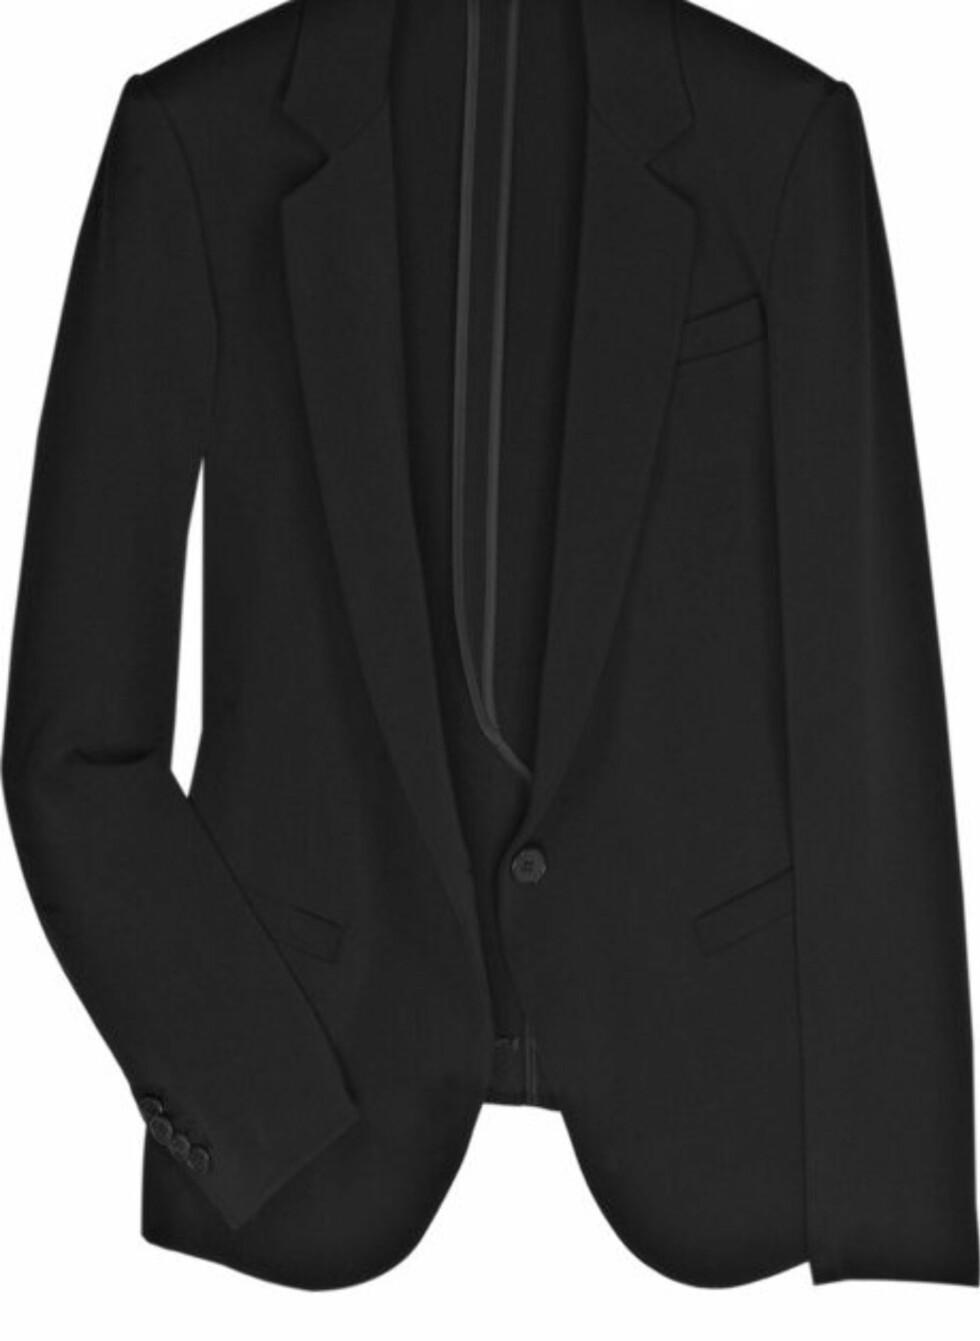 SPAR 2580 KRONER: Svart elegant dressjakke (cirka kr 1120, Theory/Theoutnet.com).